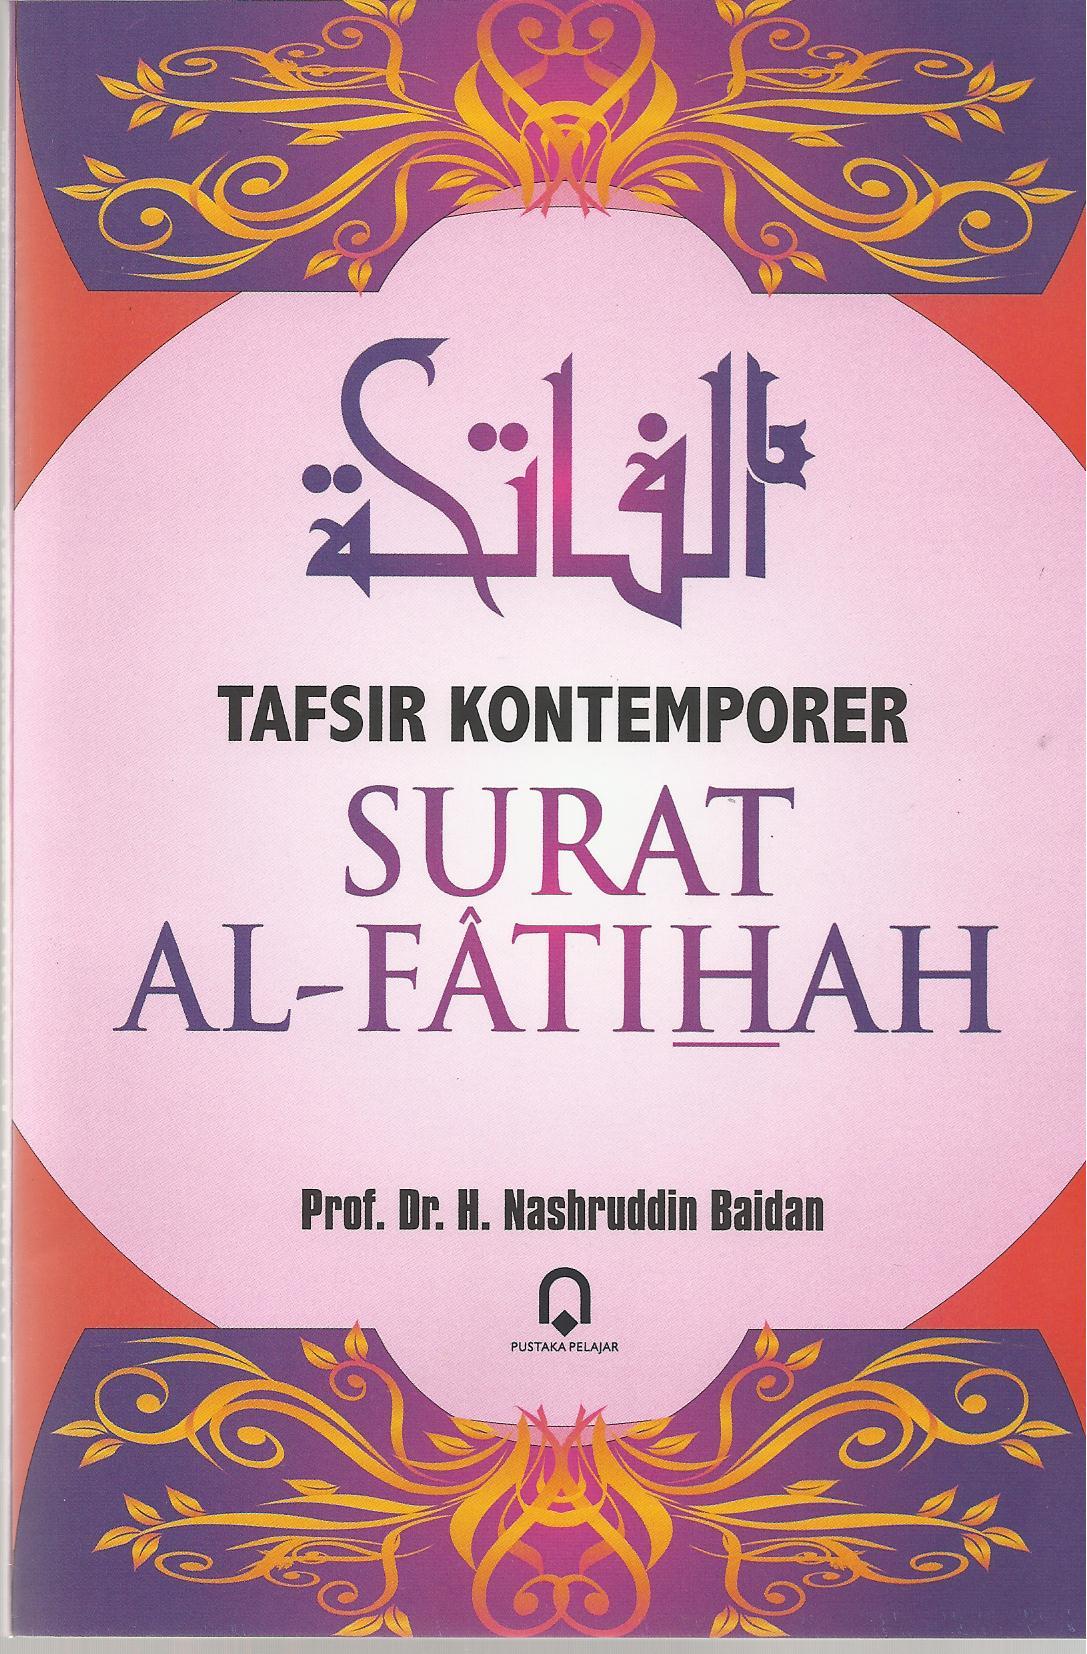 Tafsir Kontemporer Surat Al-Fatihah